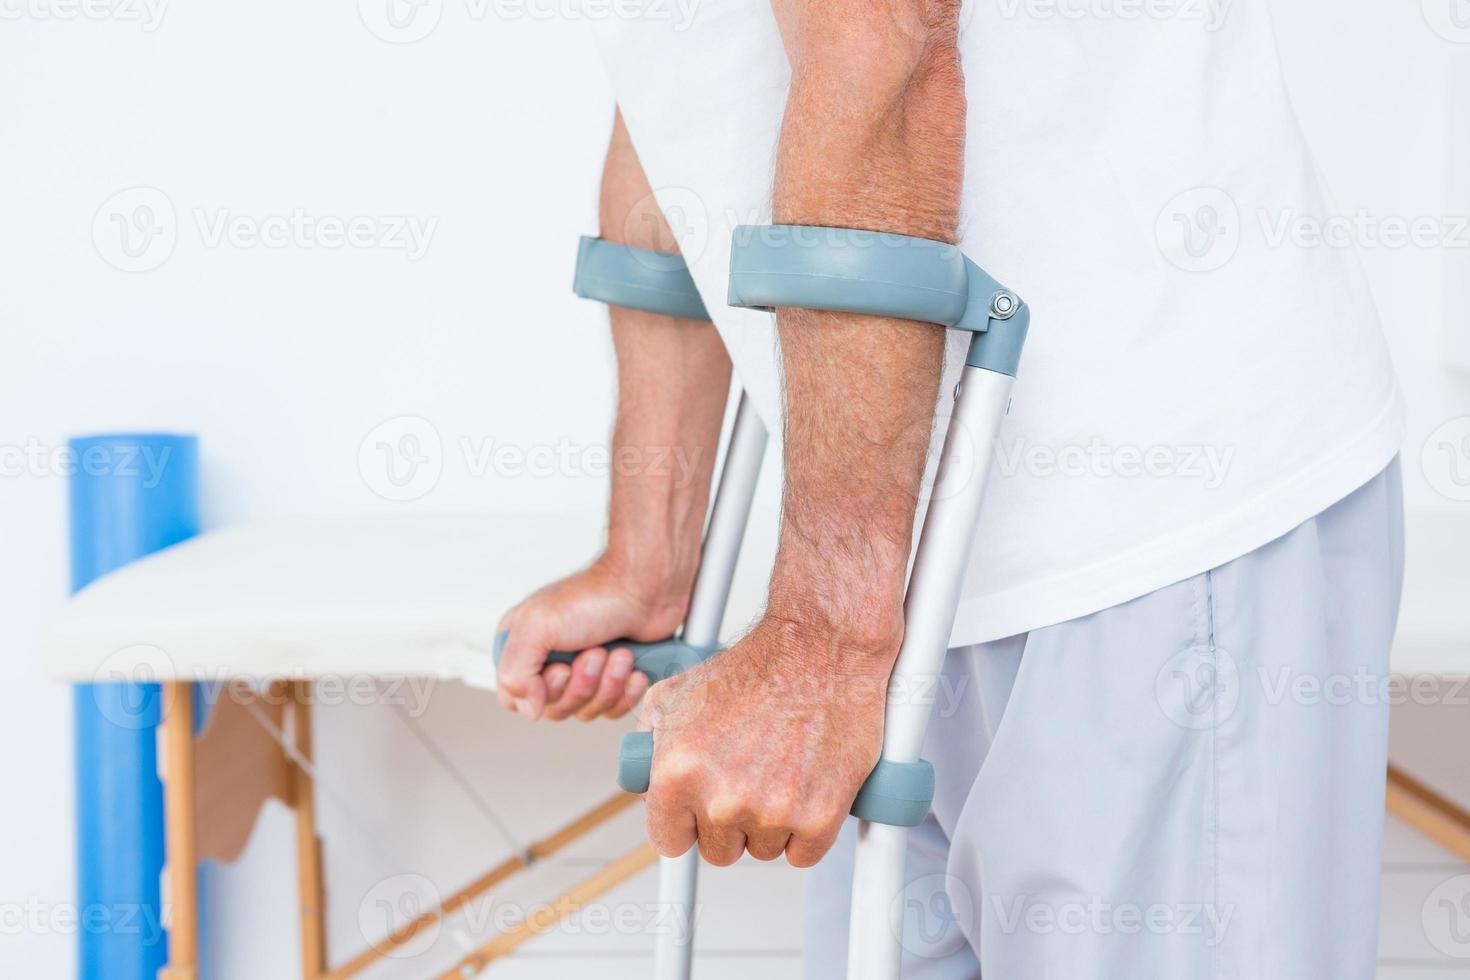 paciente de pie con muleta foto